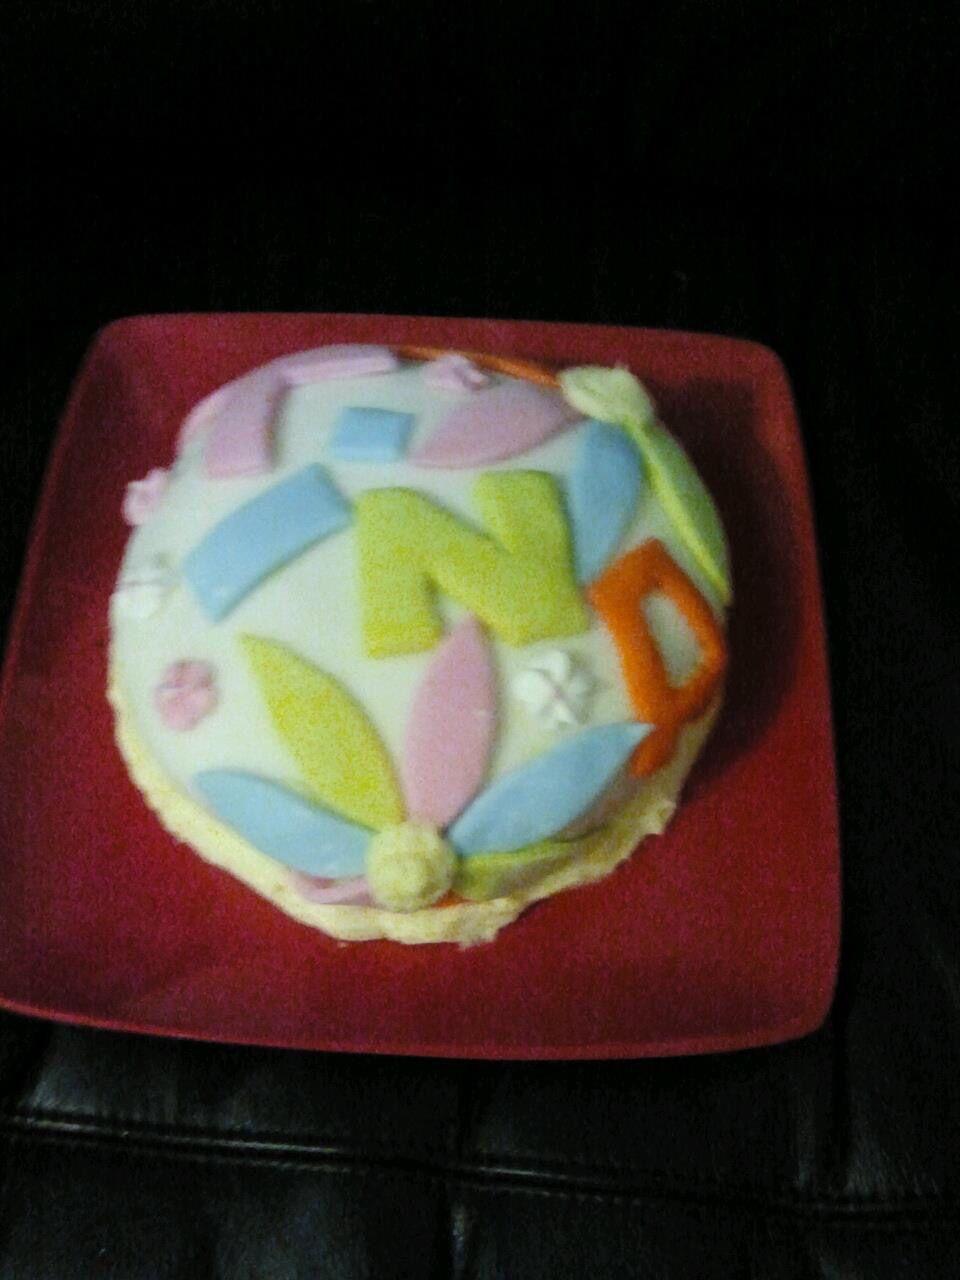 Tina's first birthday cake I ever made her